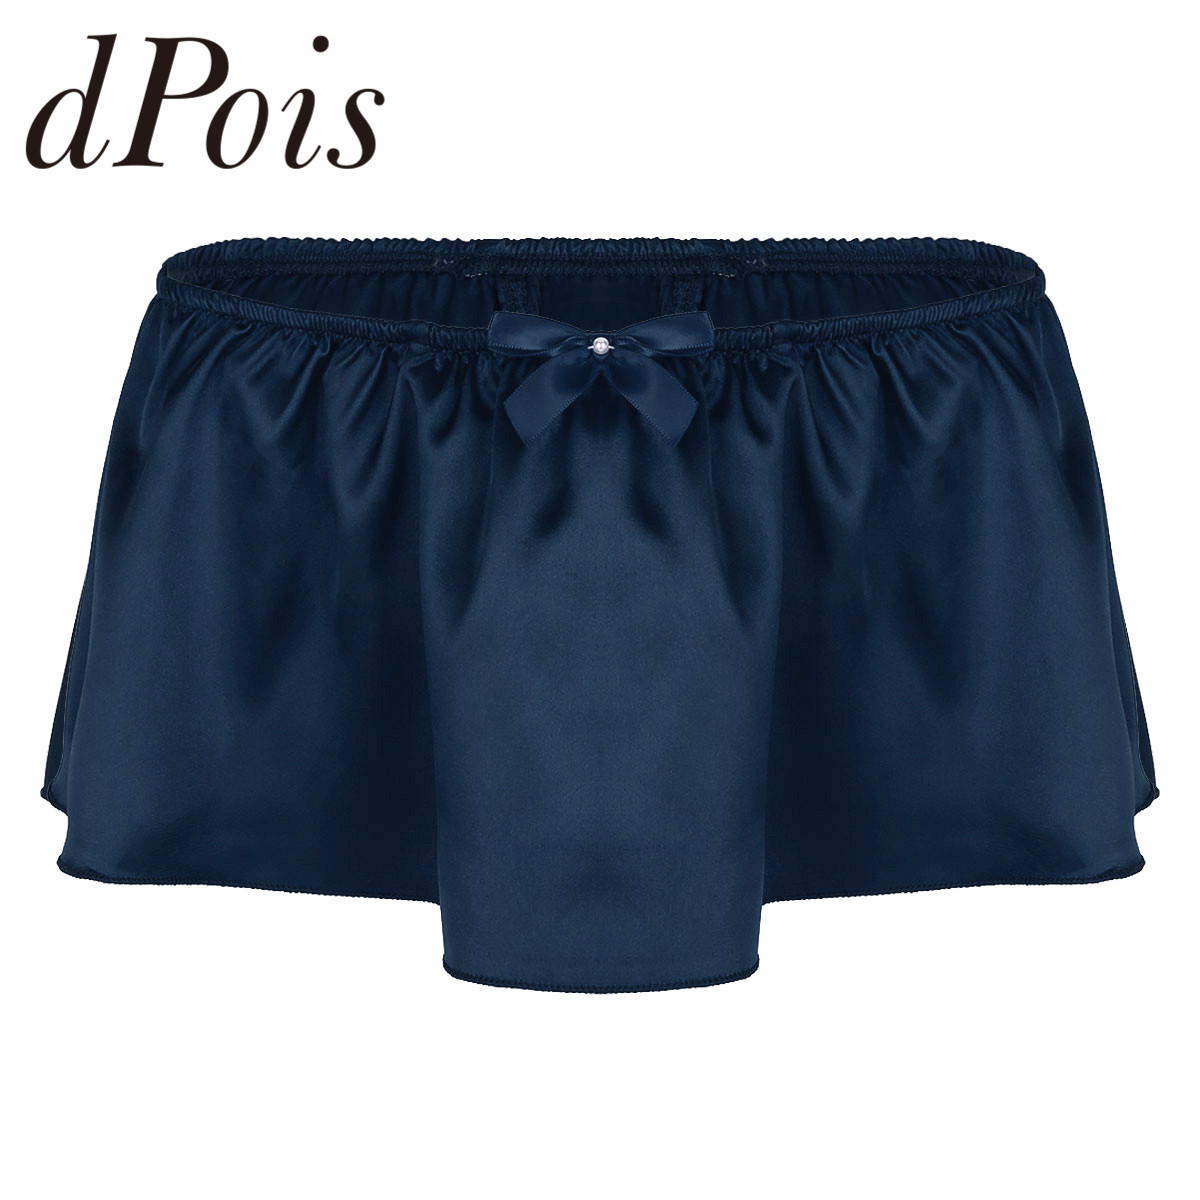 Mens Soft Satin Exposed G-string Thong Dress Ruffled Skirted Panties Briefs Men Short Skirts